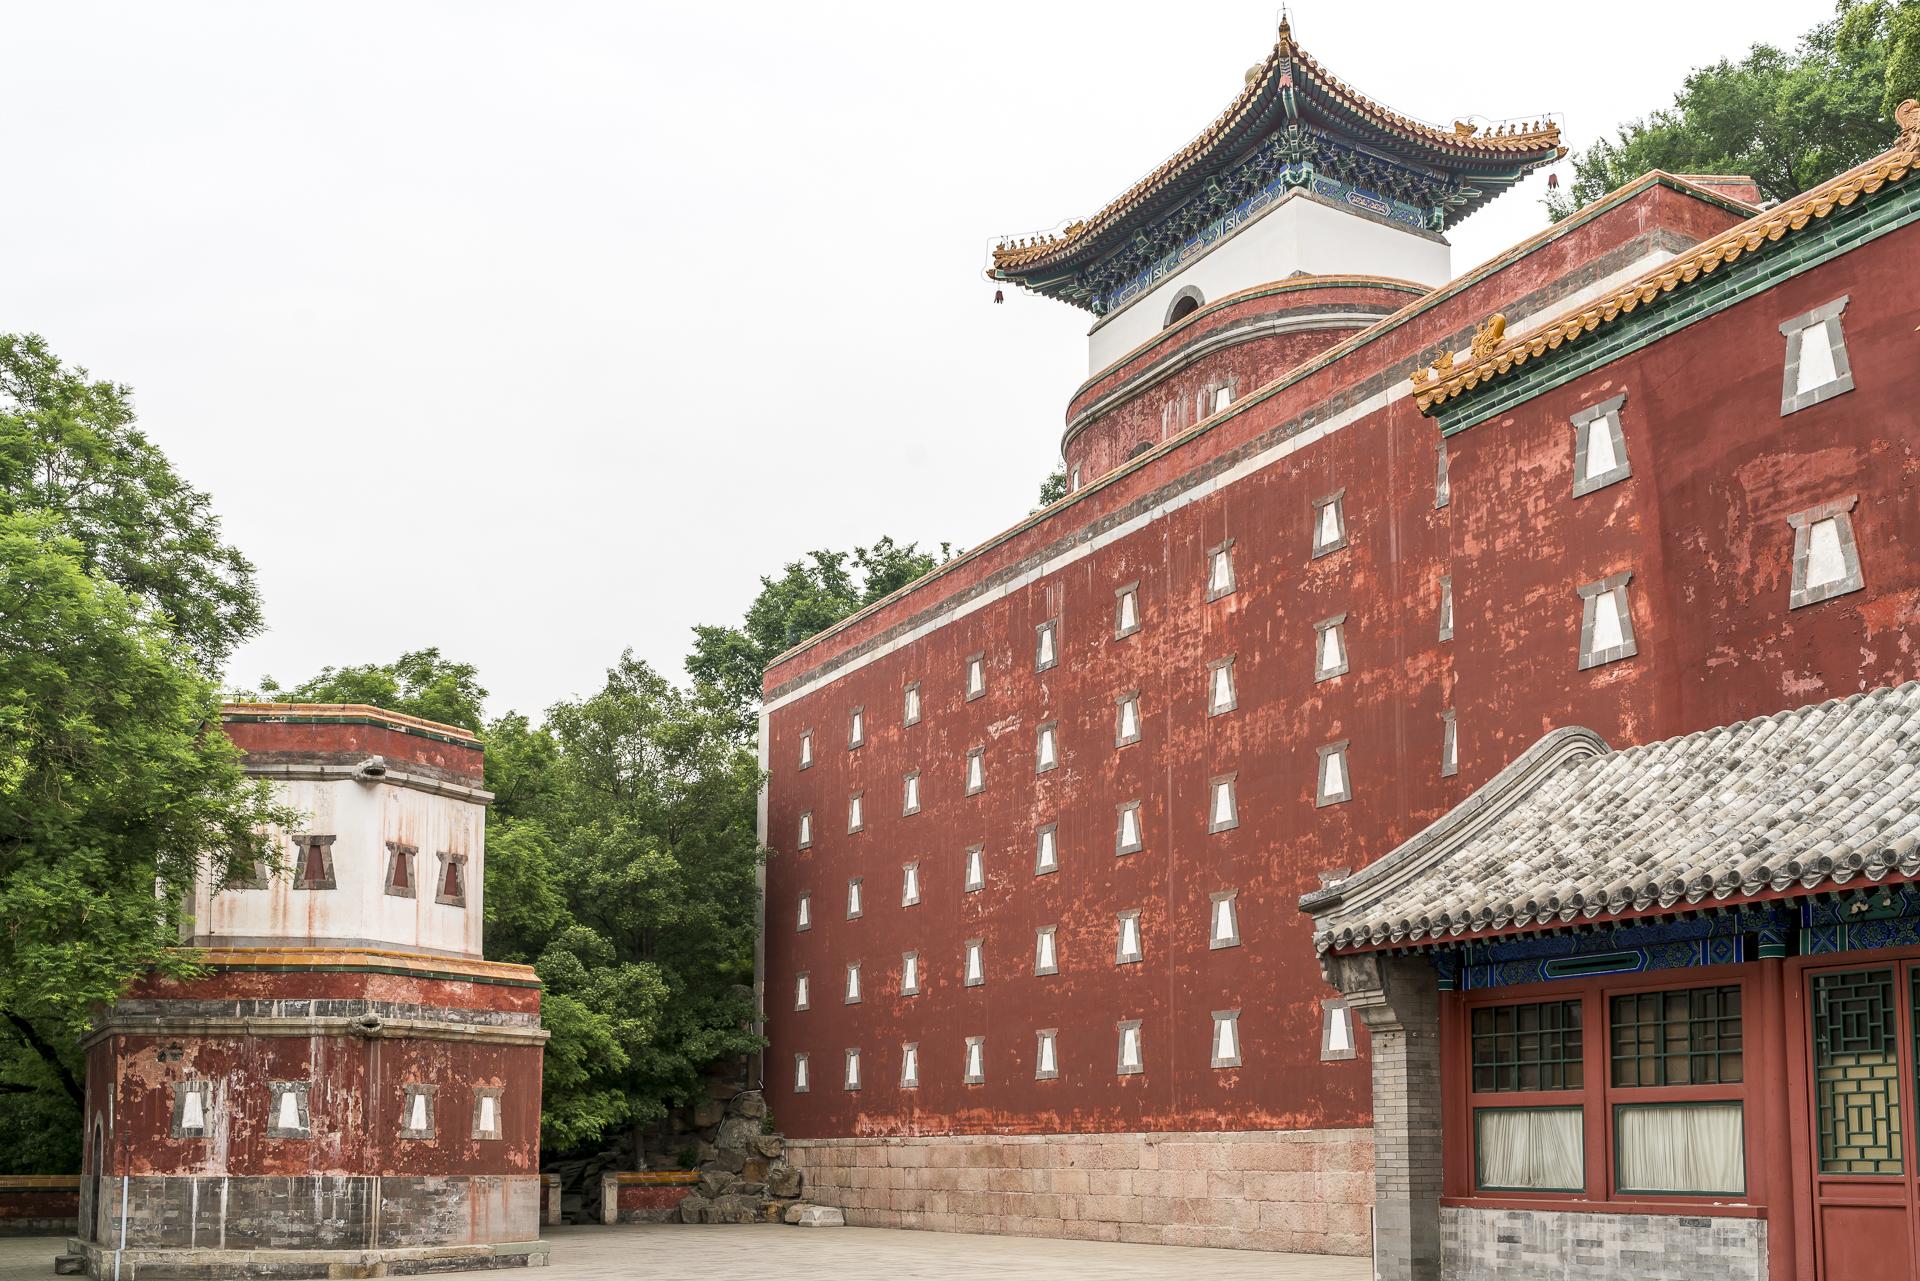 Architektur Sommerpalast Peking